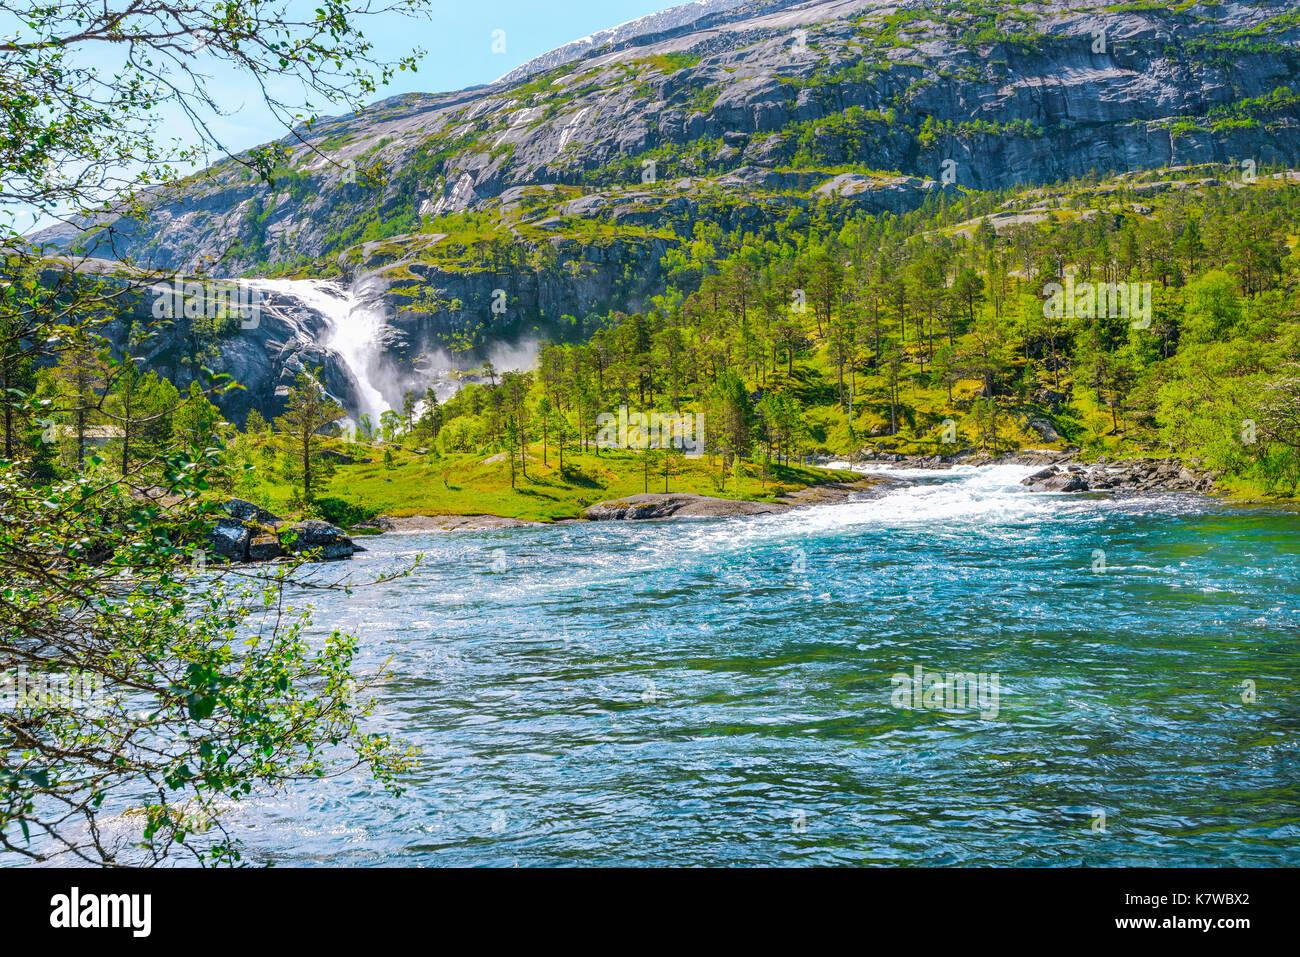 Nykkjesoyfossen falls in the Husedalen valley, near Kinsarvik at the Hardangerfjord, Norway, Scandinavia - Stock Image